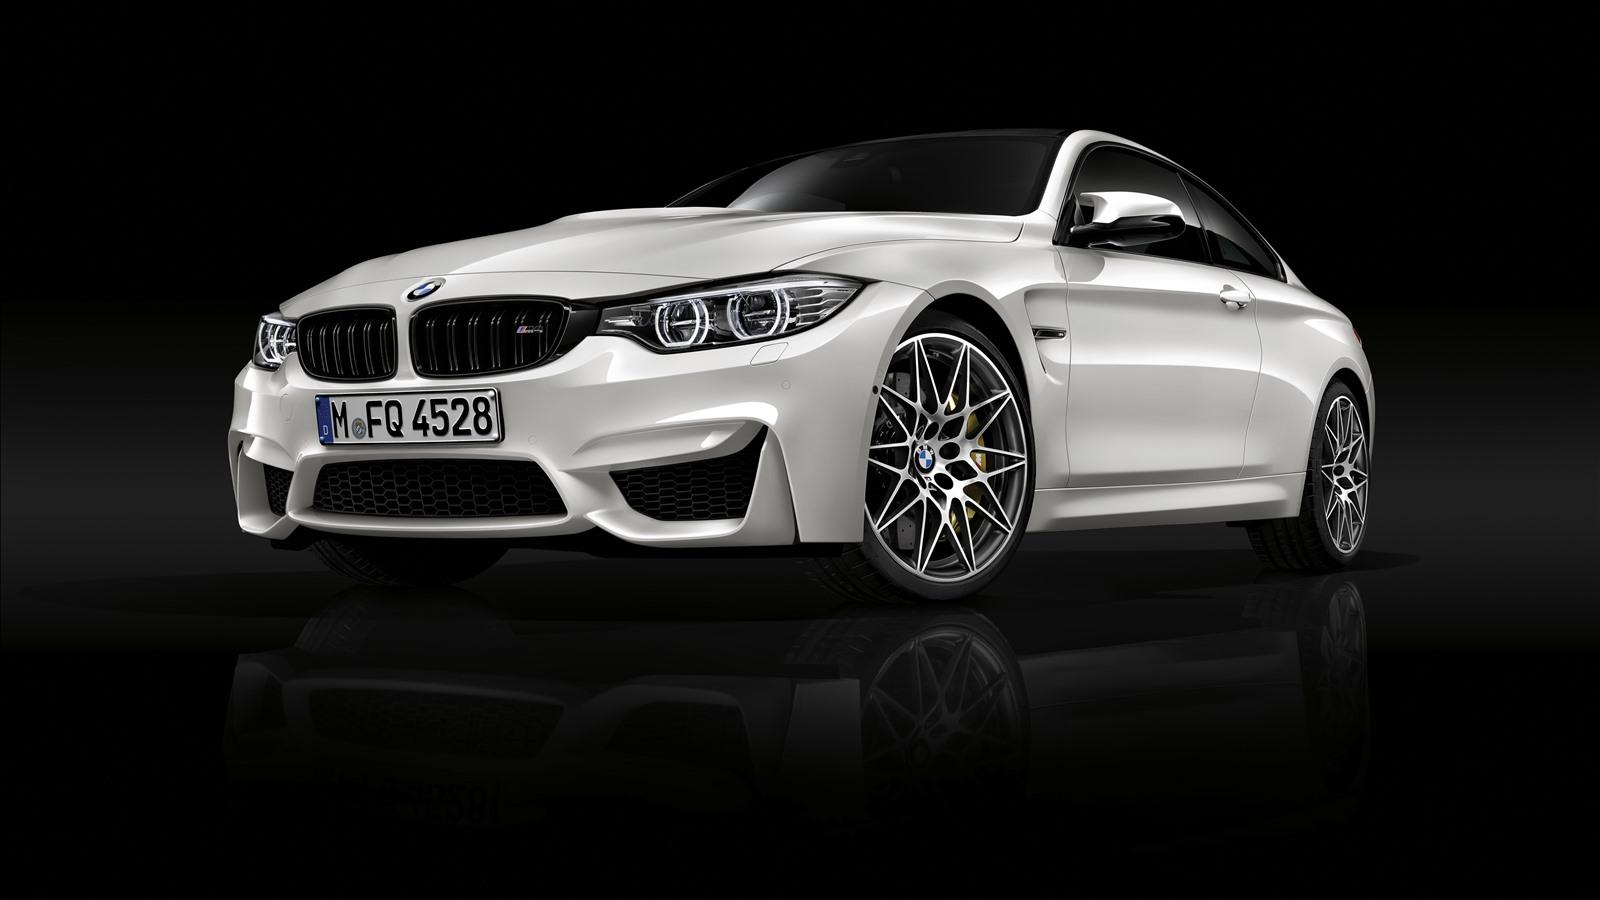 Wallpaper BMW M4 white car front view, black background ...